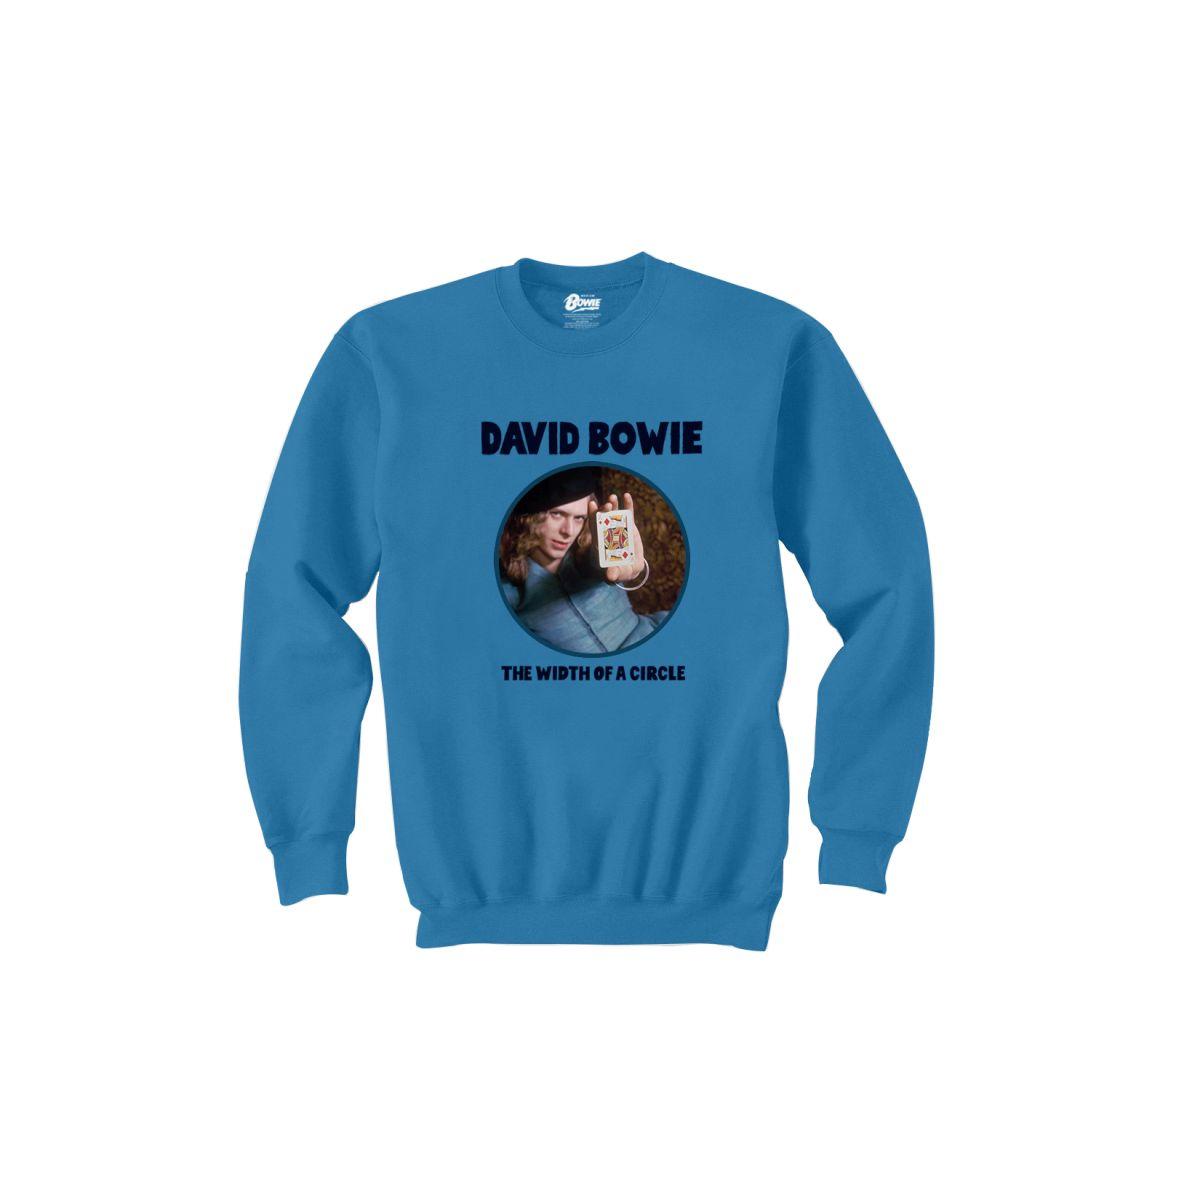 David Bowie The Width of a Circle Crewneck